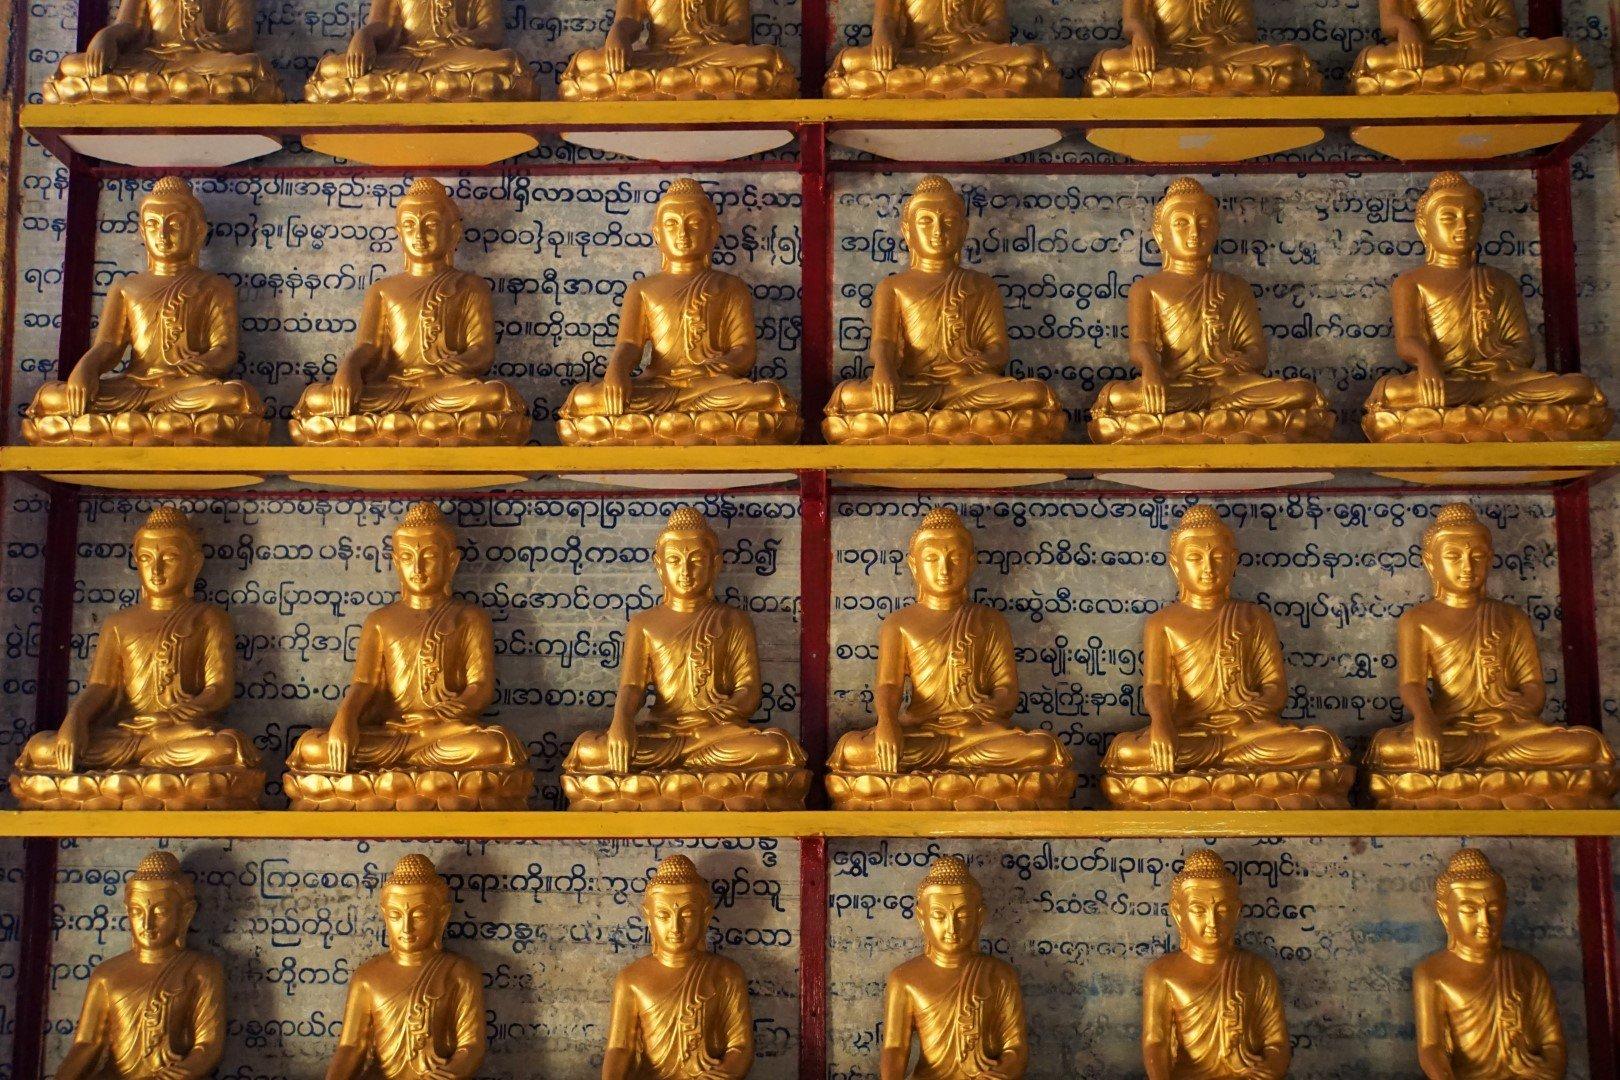 Boeddhabeelden bij Thanboddhay nabij Monywa, Myanmar